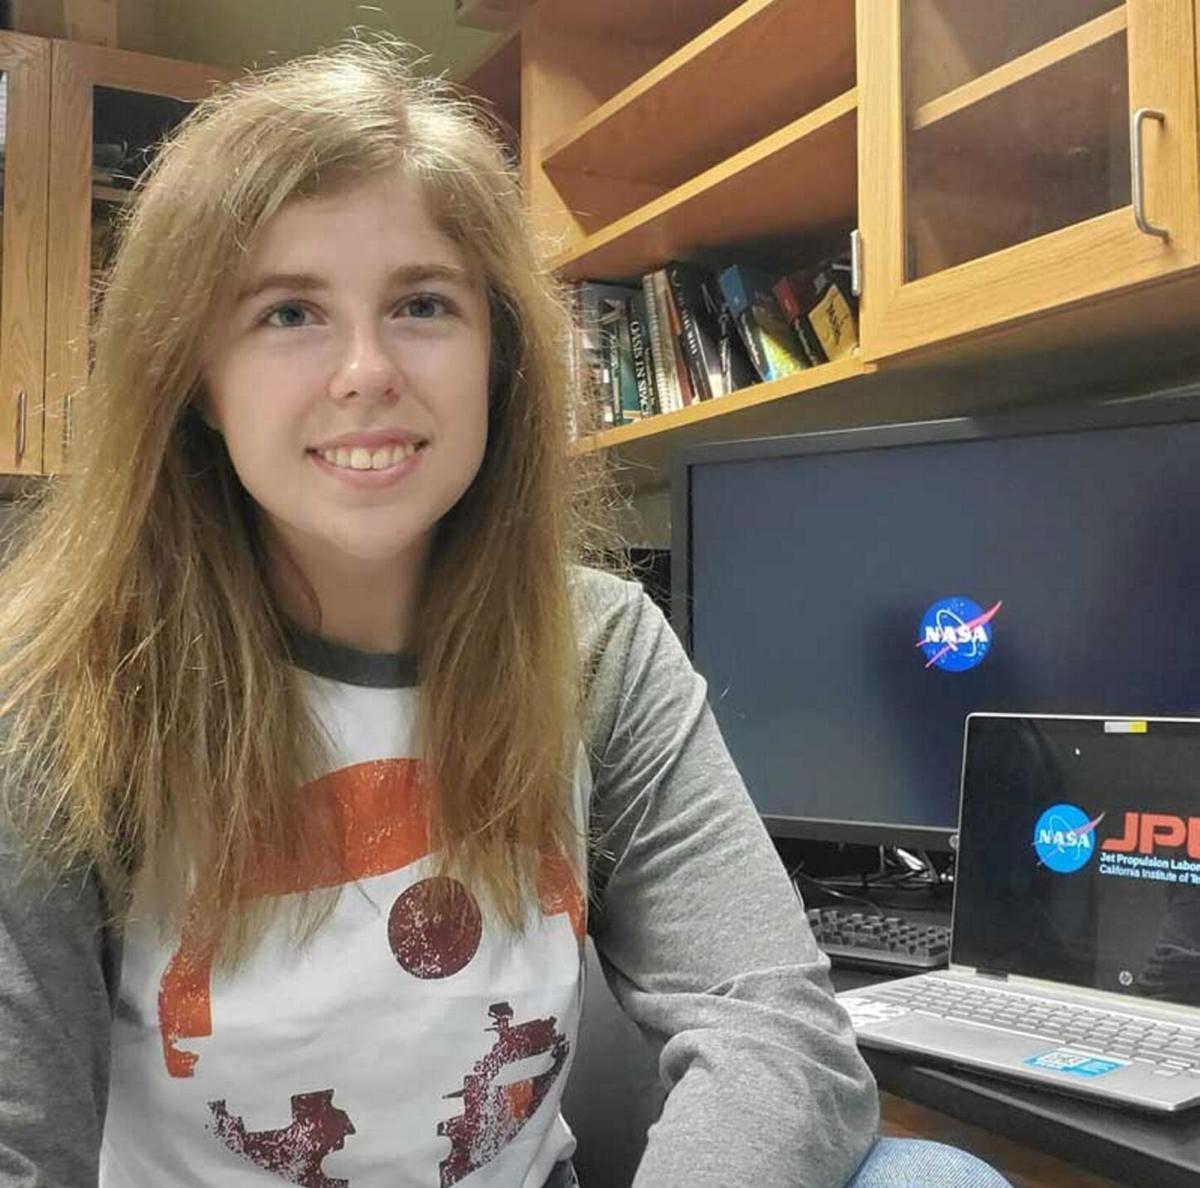 SUNY Geneseo students' work impacts NASA Mars missions